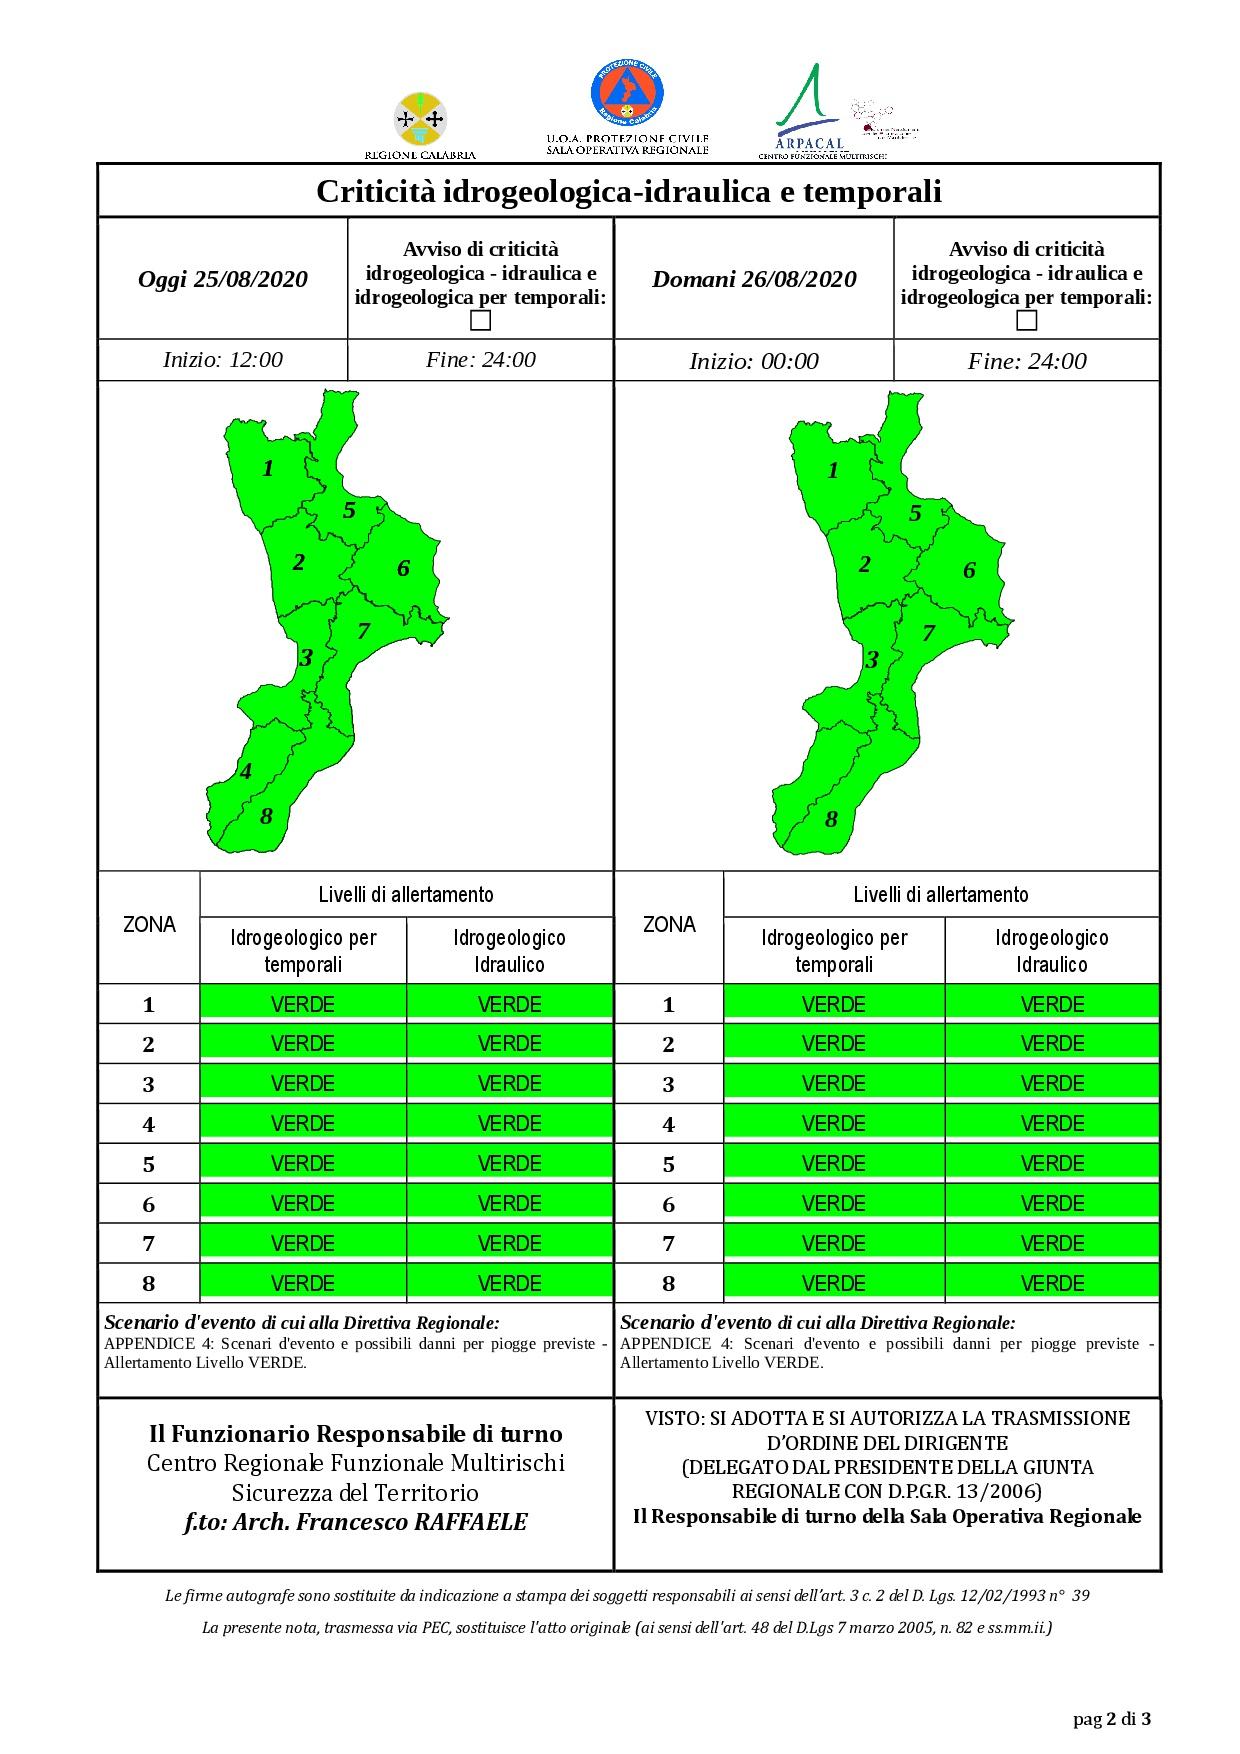 Criticità idrogeologica-idraulica e temporali in Calabria 25-08-2020